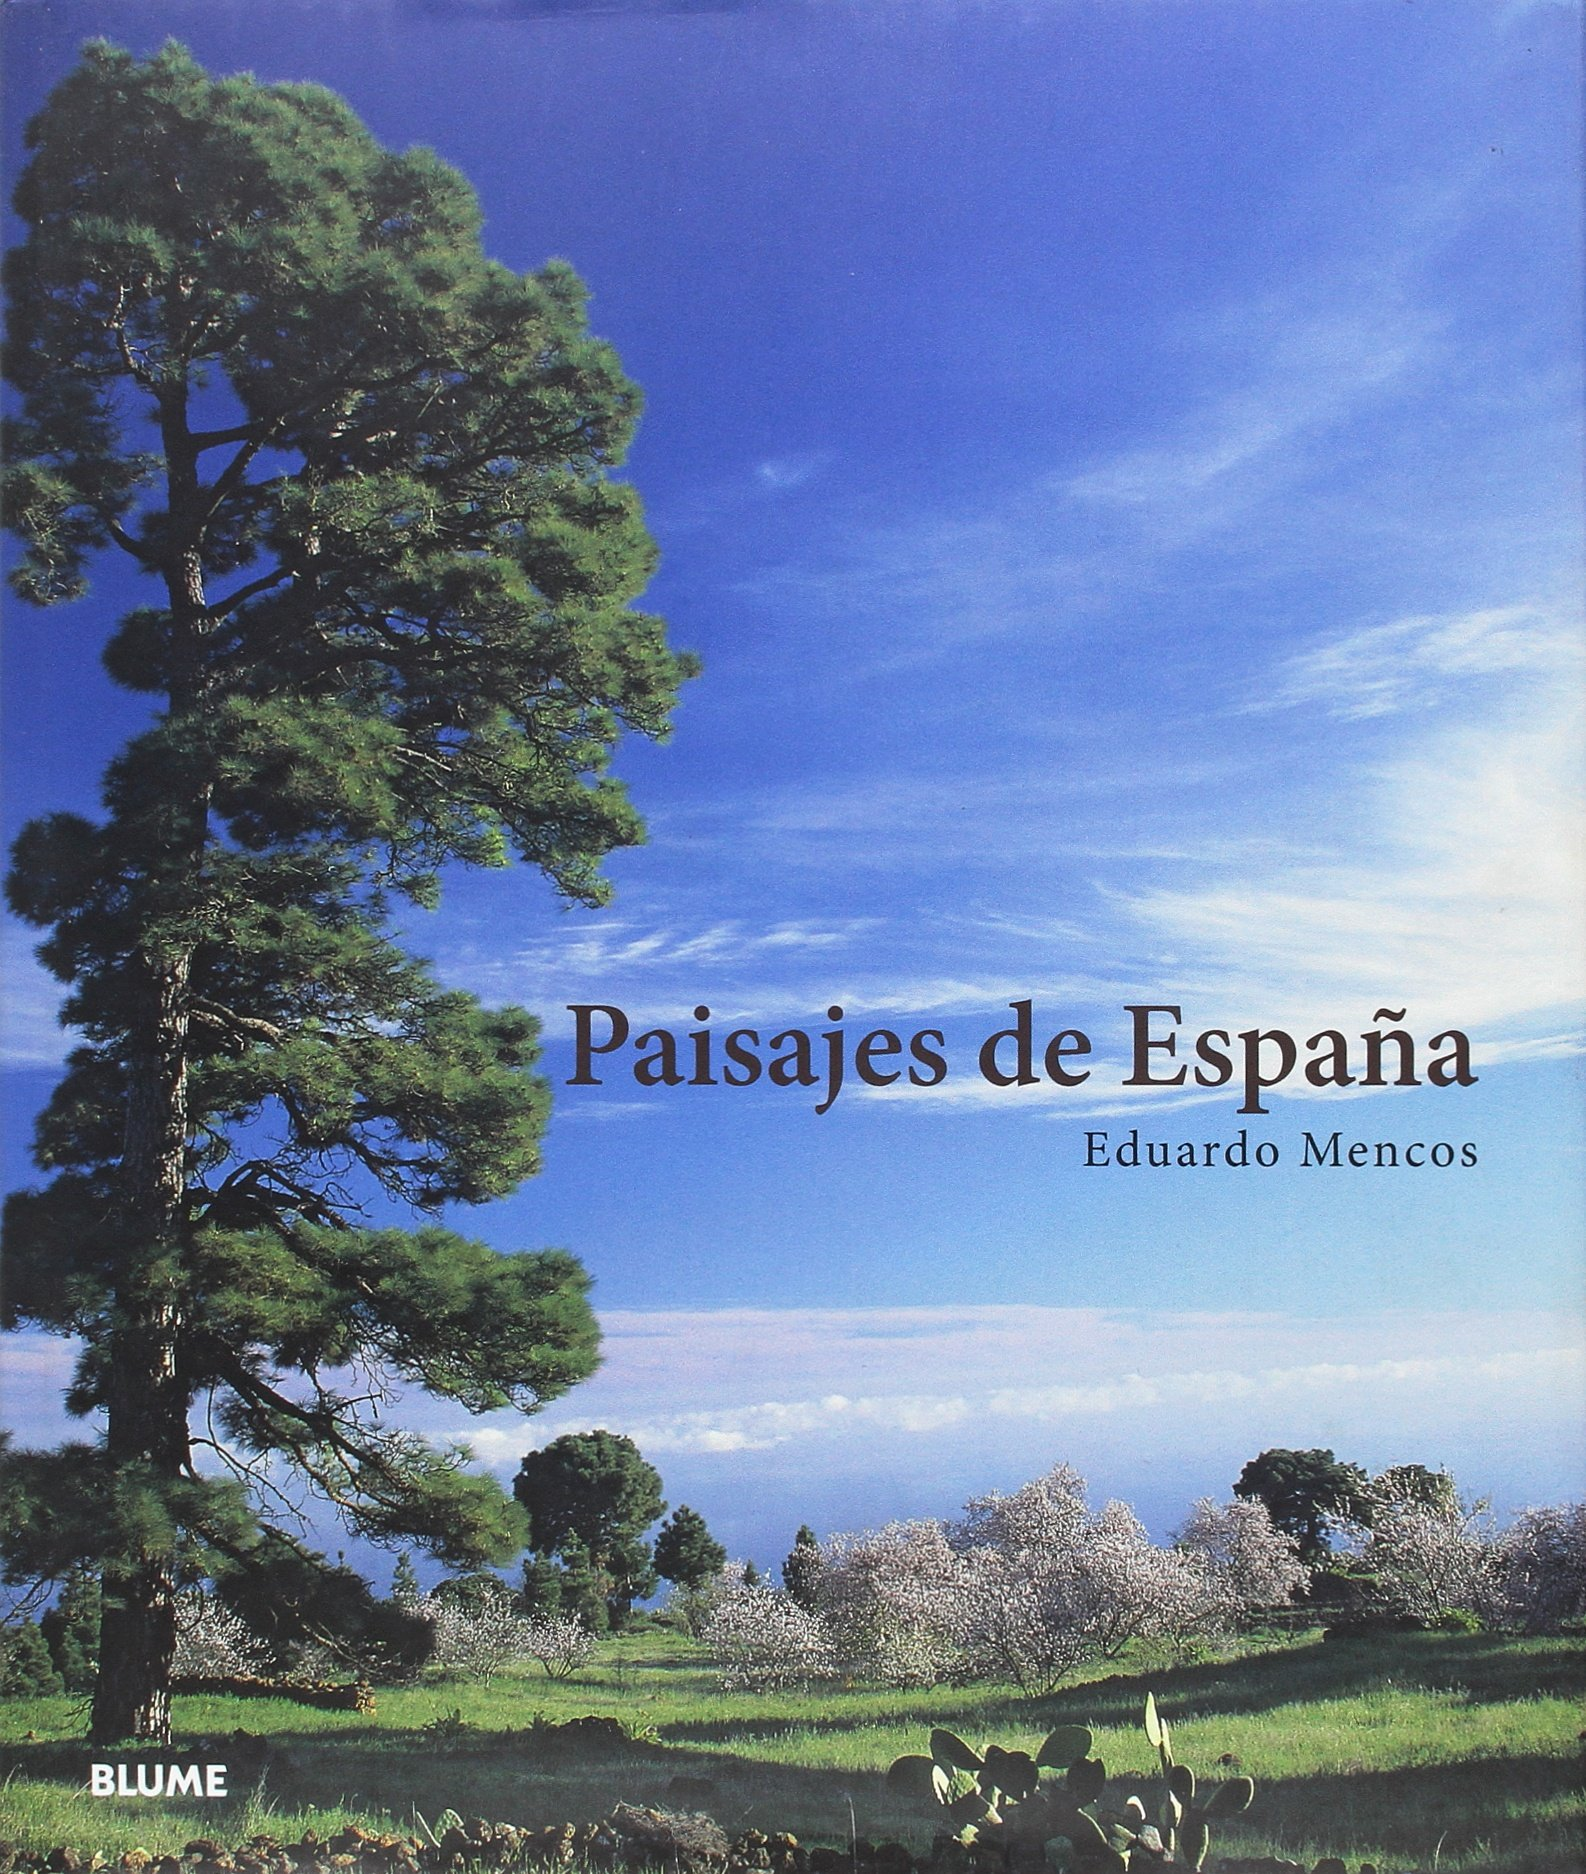 Paisajes de España En claroscuro: Amazon.es: Mencos, Eduardo: Libros